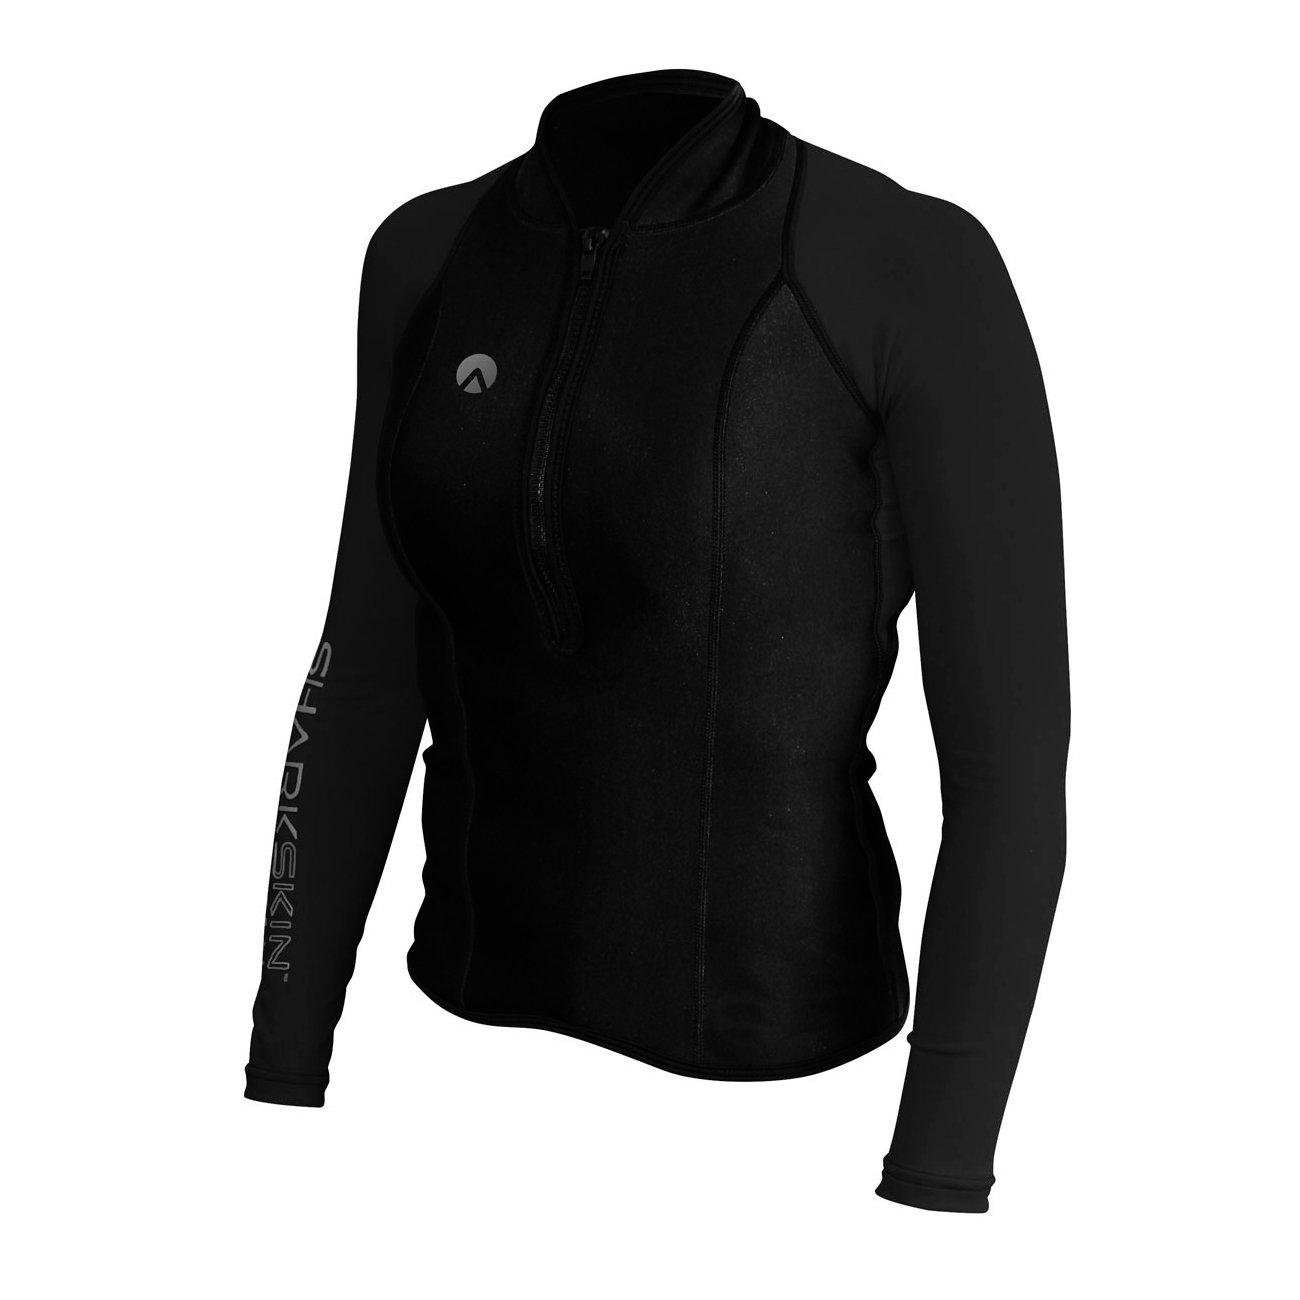 Sharkskin Women's Chillproof Performance Wear Longsleeve Shirt Rash Guard Scuba Water Sports Diving Snorkeling (Black, 0)